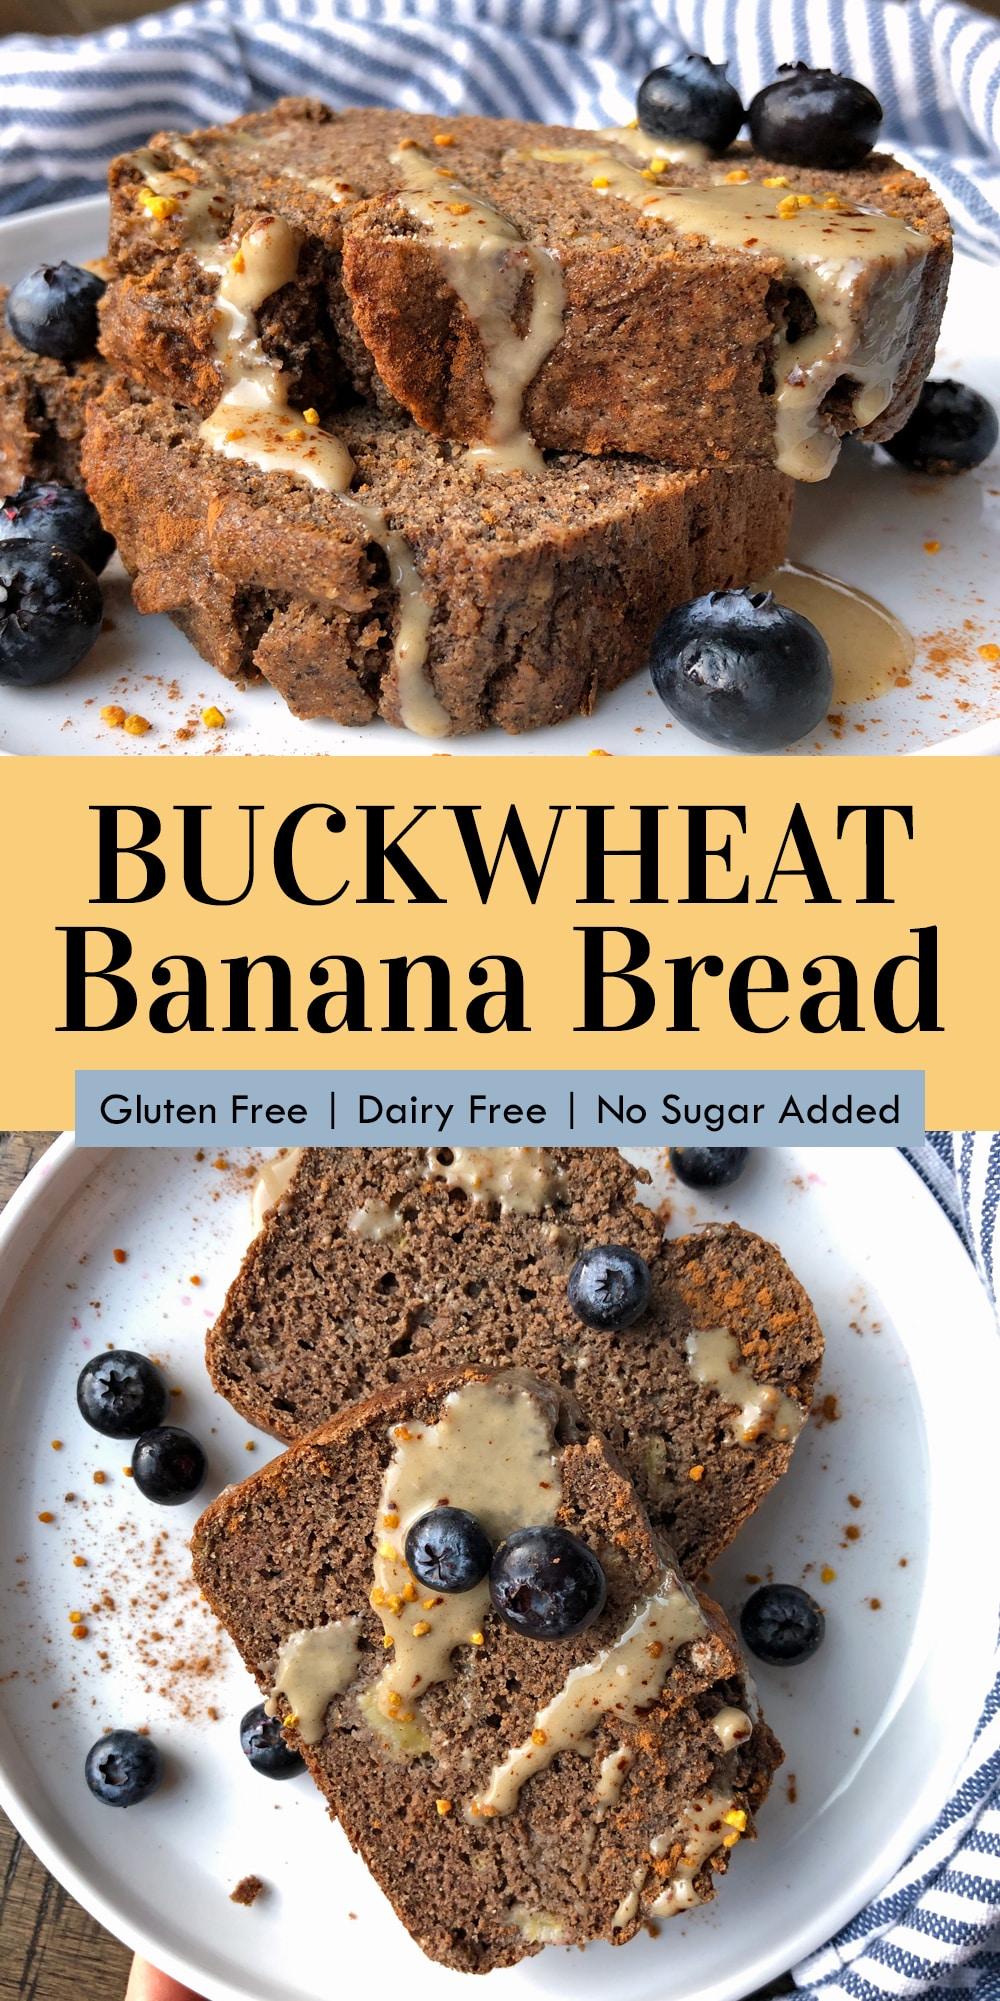 healthy-gluten-free-buckwheat-banana-bread